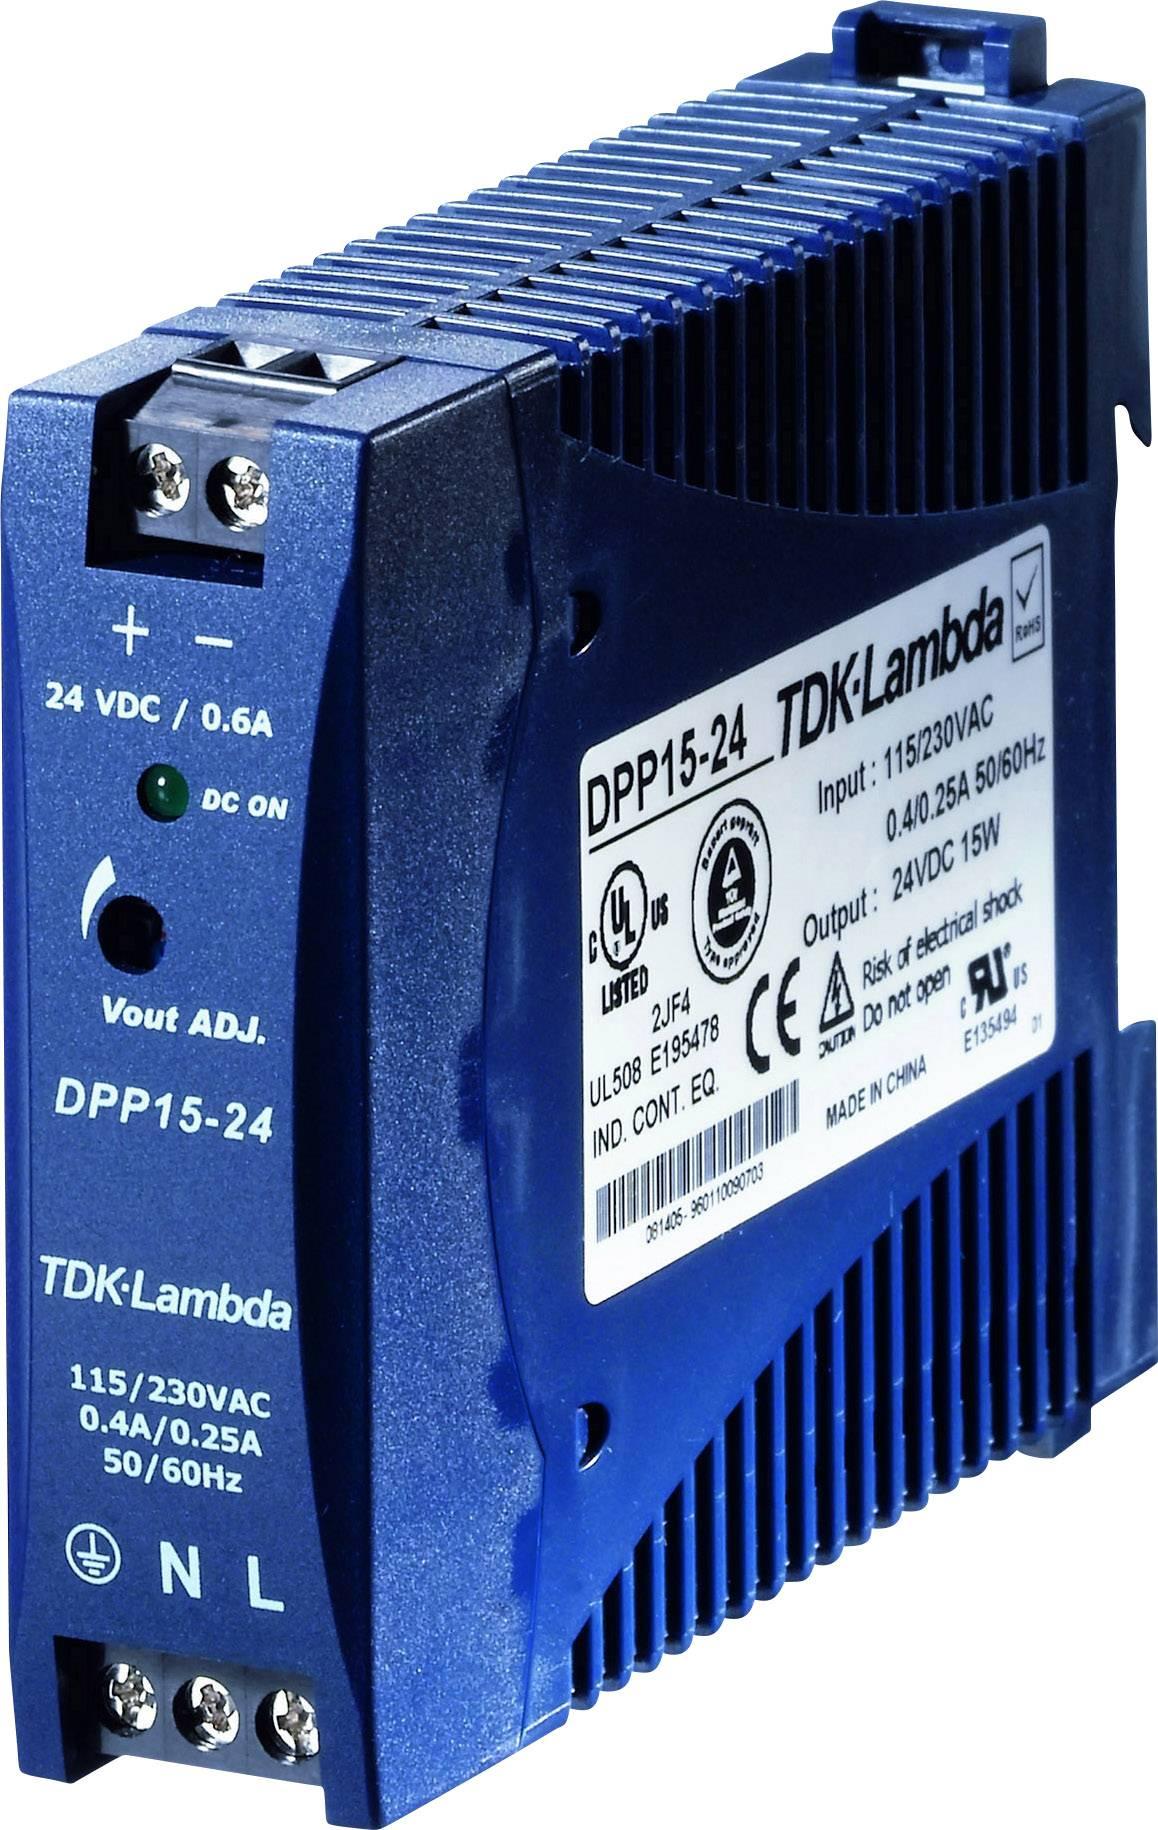 Sieťový zdroj na montážnu lištu (DIN lištu) TDK-Lambda DPP-25-5, 1 x, 5 V/DC, 5 A, 25 W